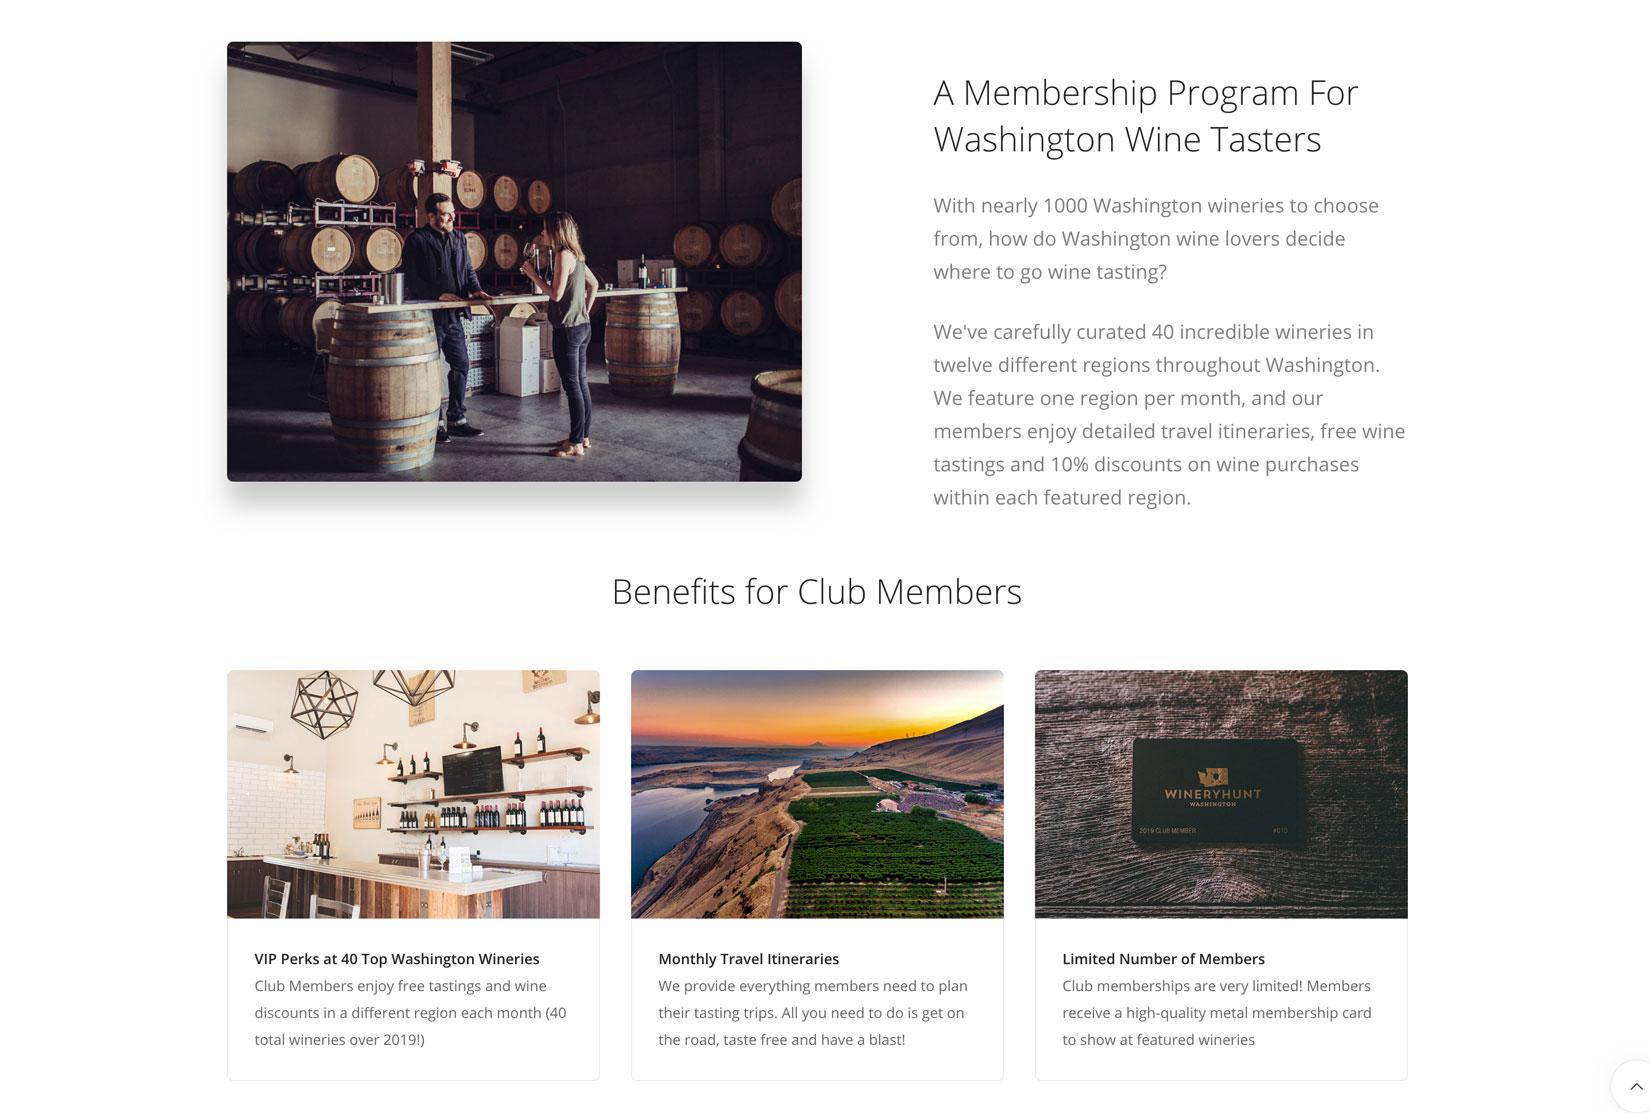 WineryHunt Washington | Vinbound Marketing